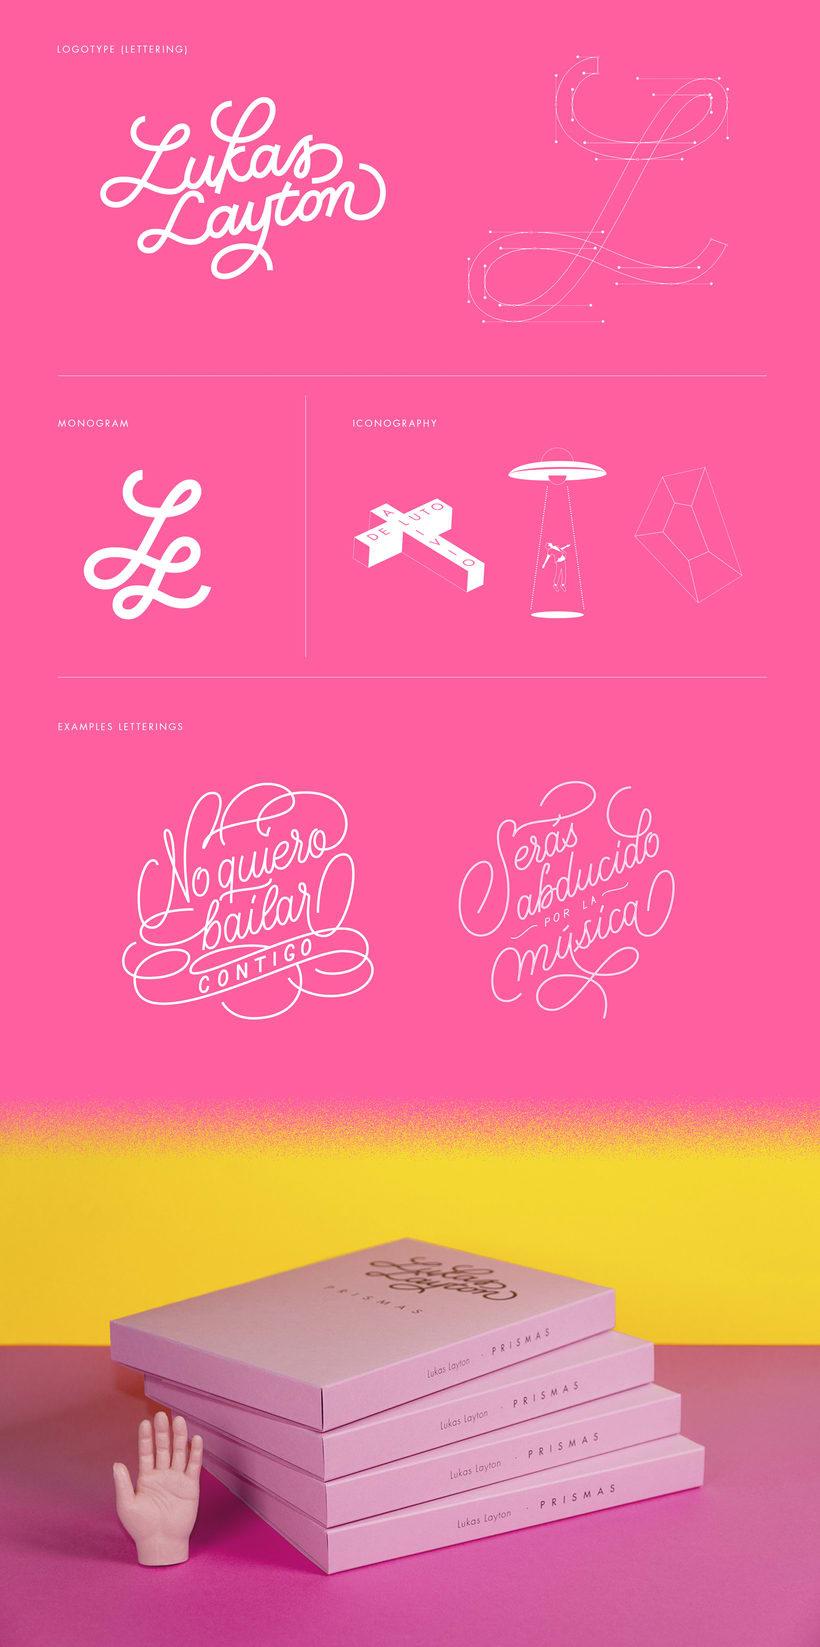 Identidad Visual - Lukas Layton 2